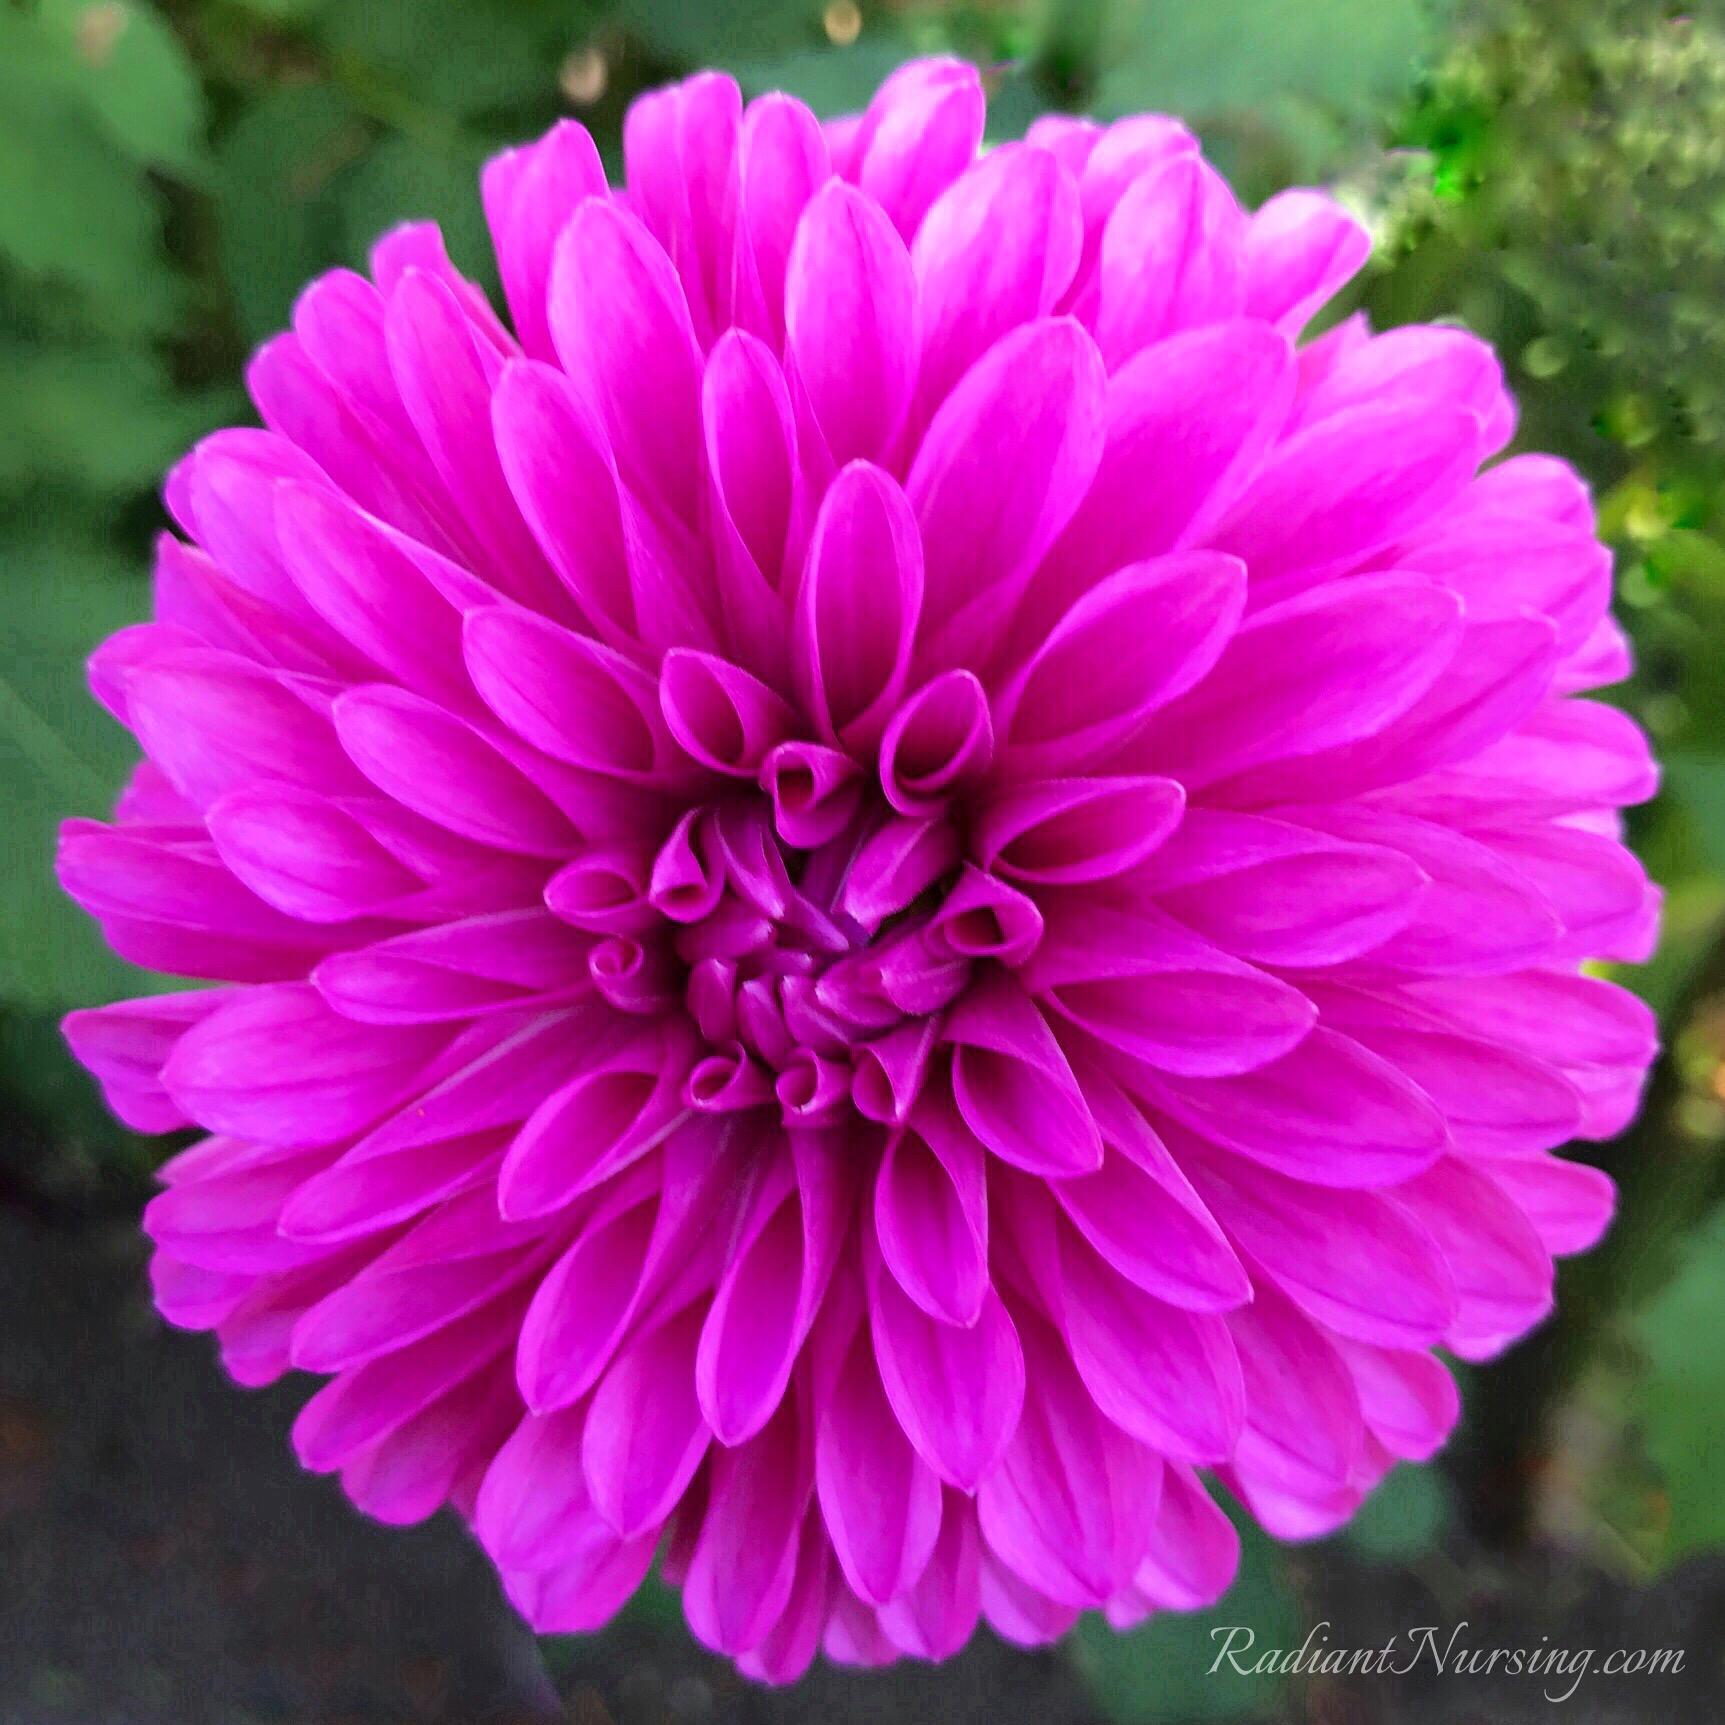 Dahlia Flowers Radiant Nursing